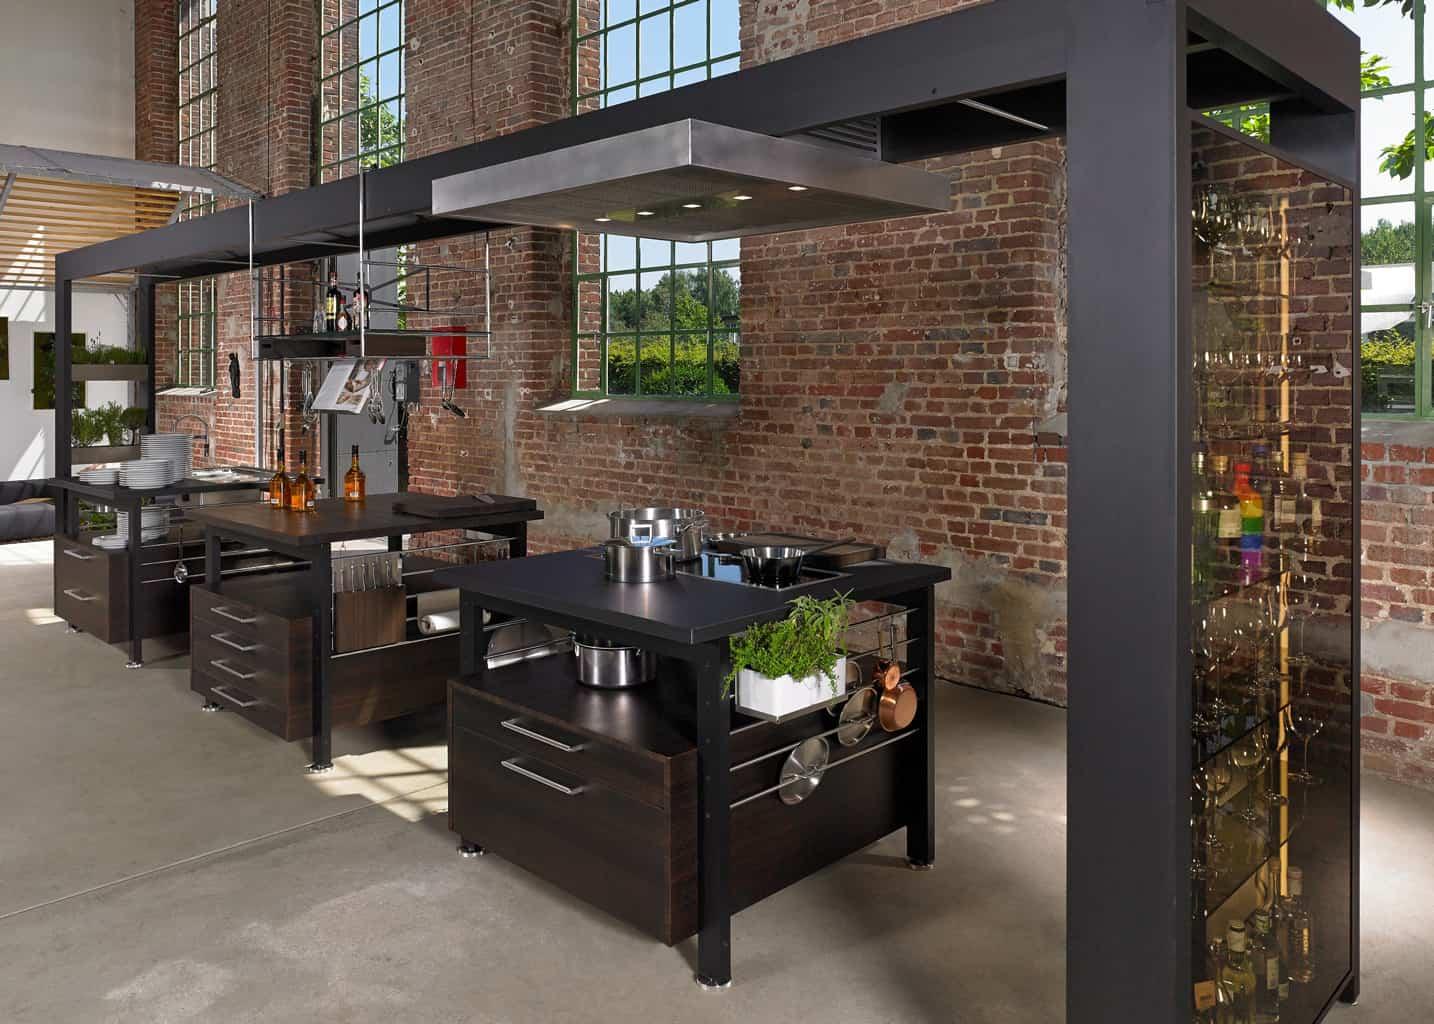 kitchen stations layout